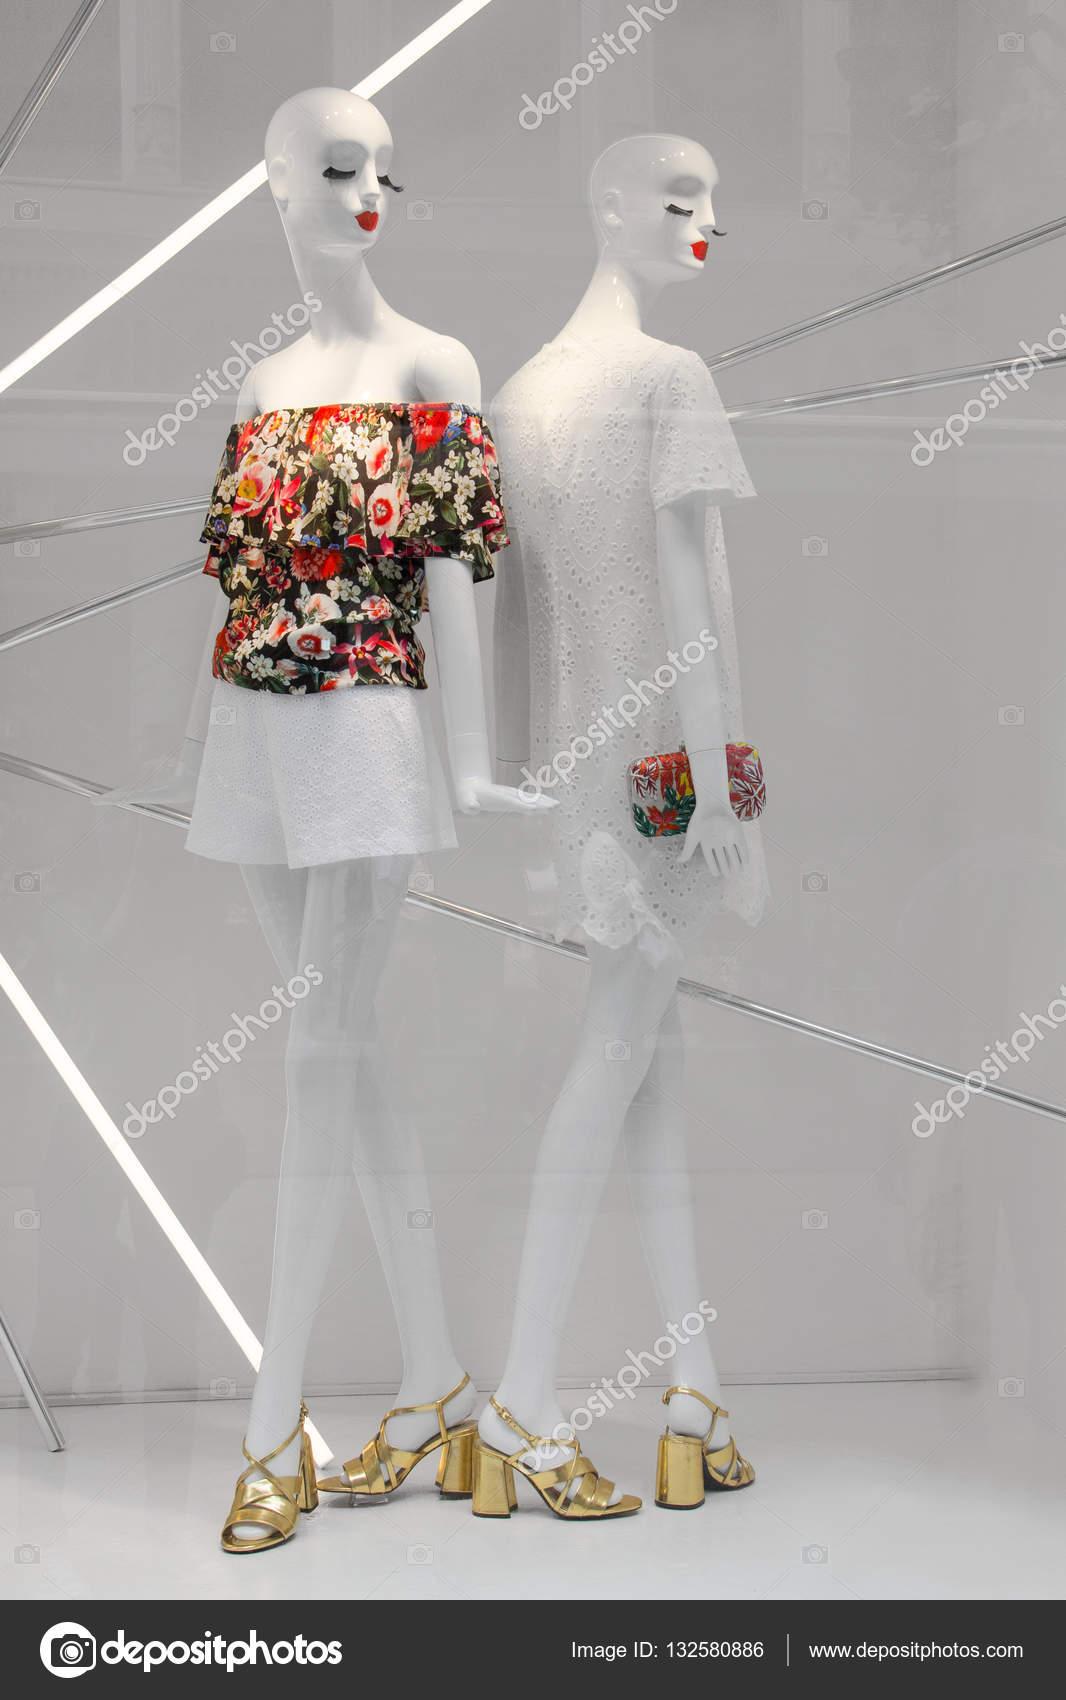 ac97f4e52c2 Dos maniquíes de moda blanco moderno vestido con ropa de verano flores, en  una ventana de blanco moderno boutique. — Foto de vevchic@gmail.com